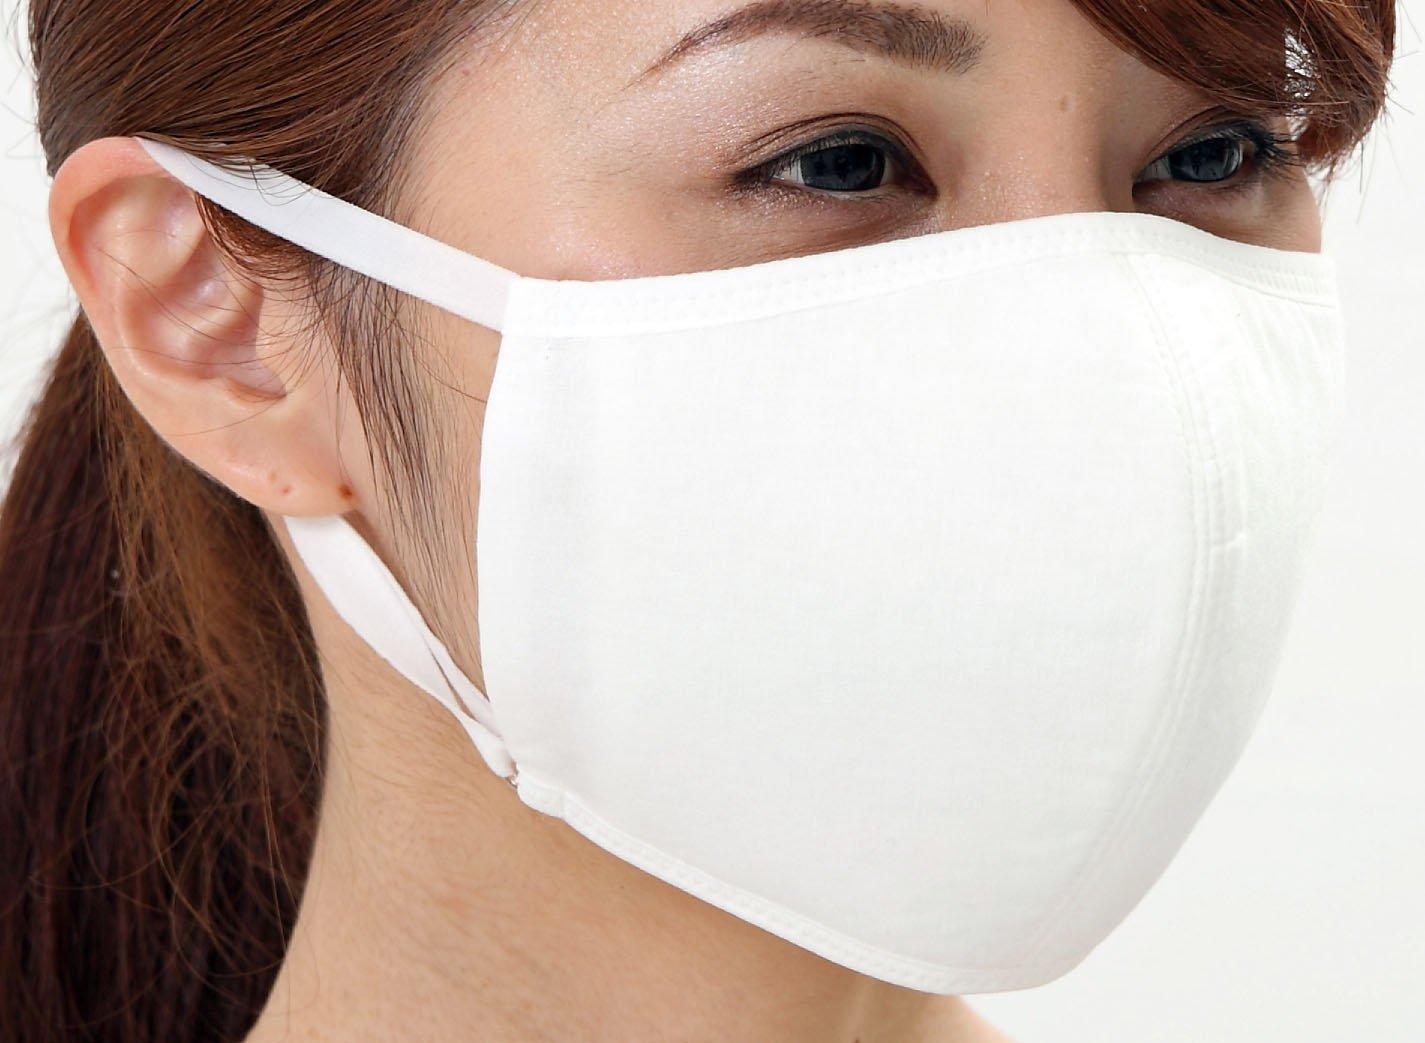 Tuyon Moisture Mask With UV protection, Washable Reusable 2 White